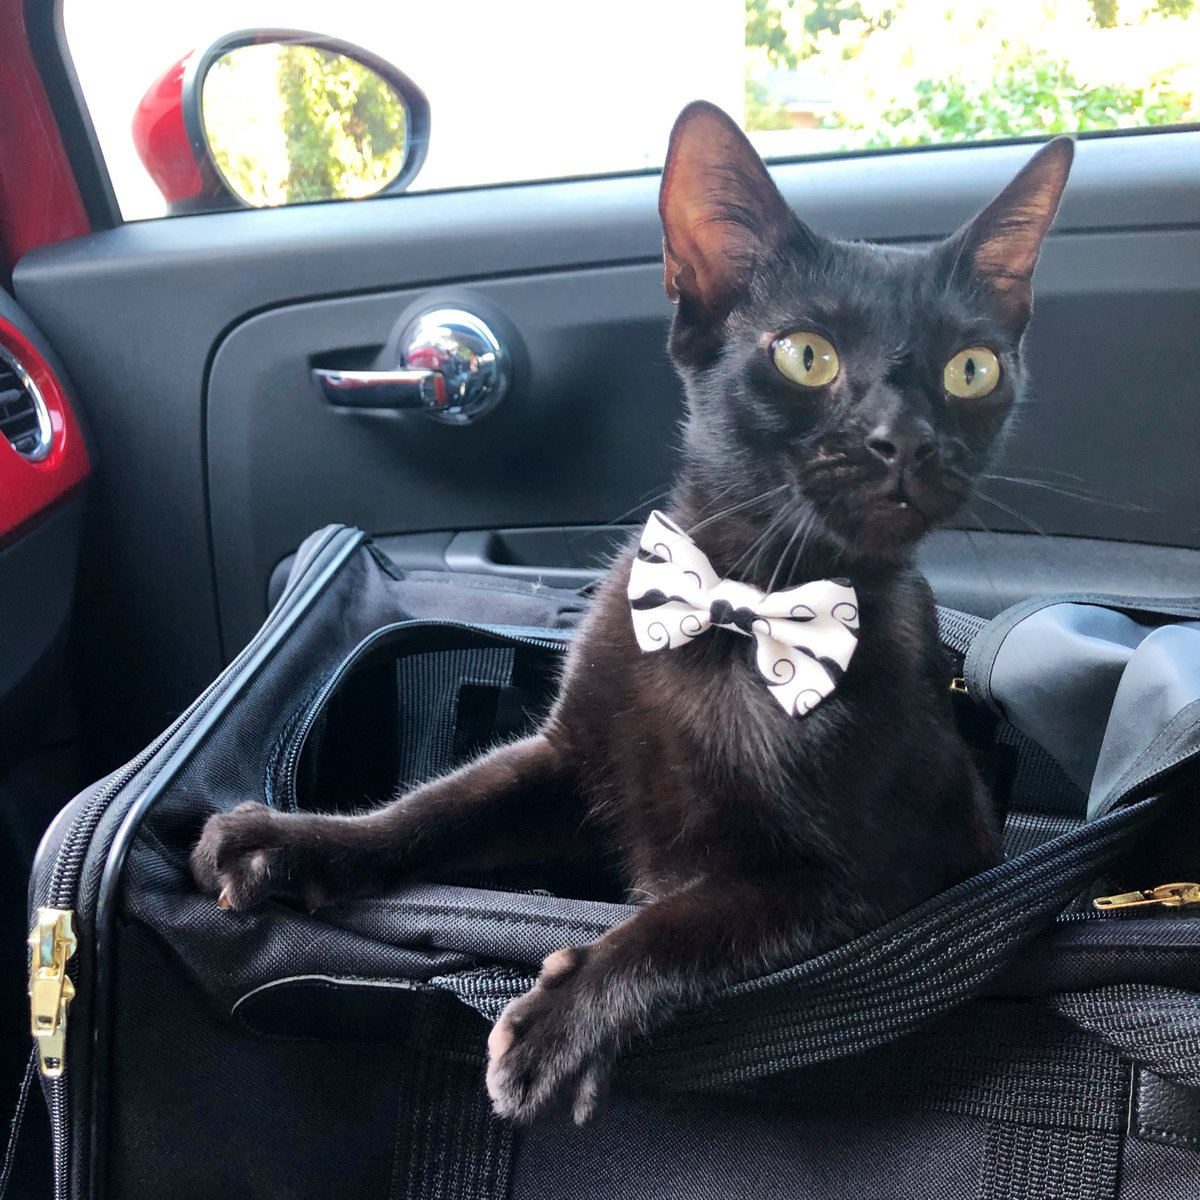 Weekend time! Who is ready?  #CatsOfTwitter #catsofinstagram #kitty #pet #cutecats #adventurecat #bowtie #catstagram #kittycat #meow #FridayThoughts #readyfortheweekend<br>http://pic.twitter.com/TAX4JeDiMr